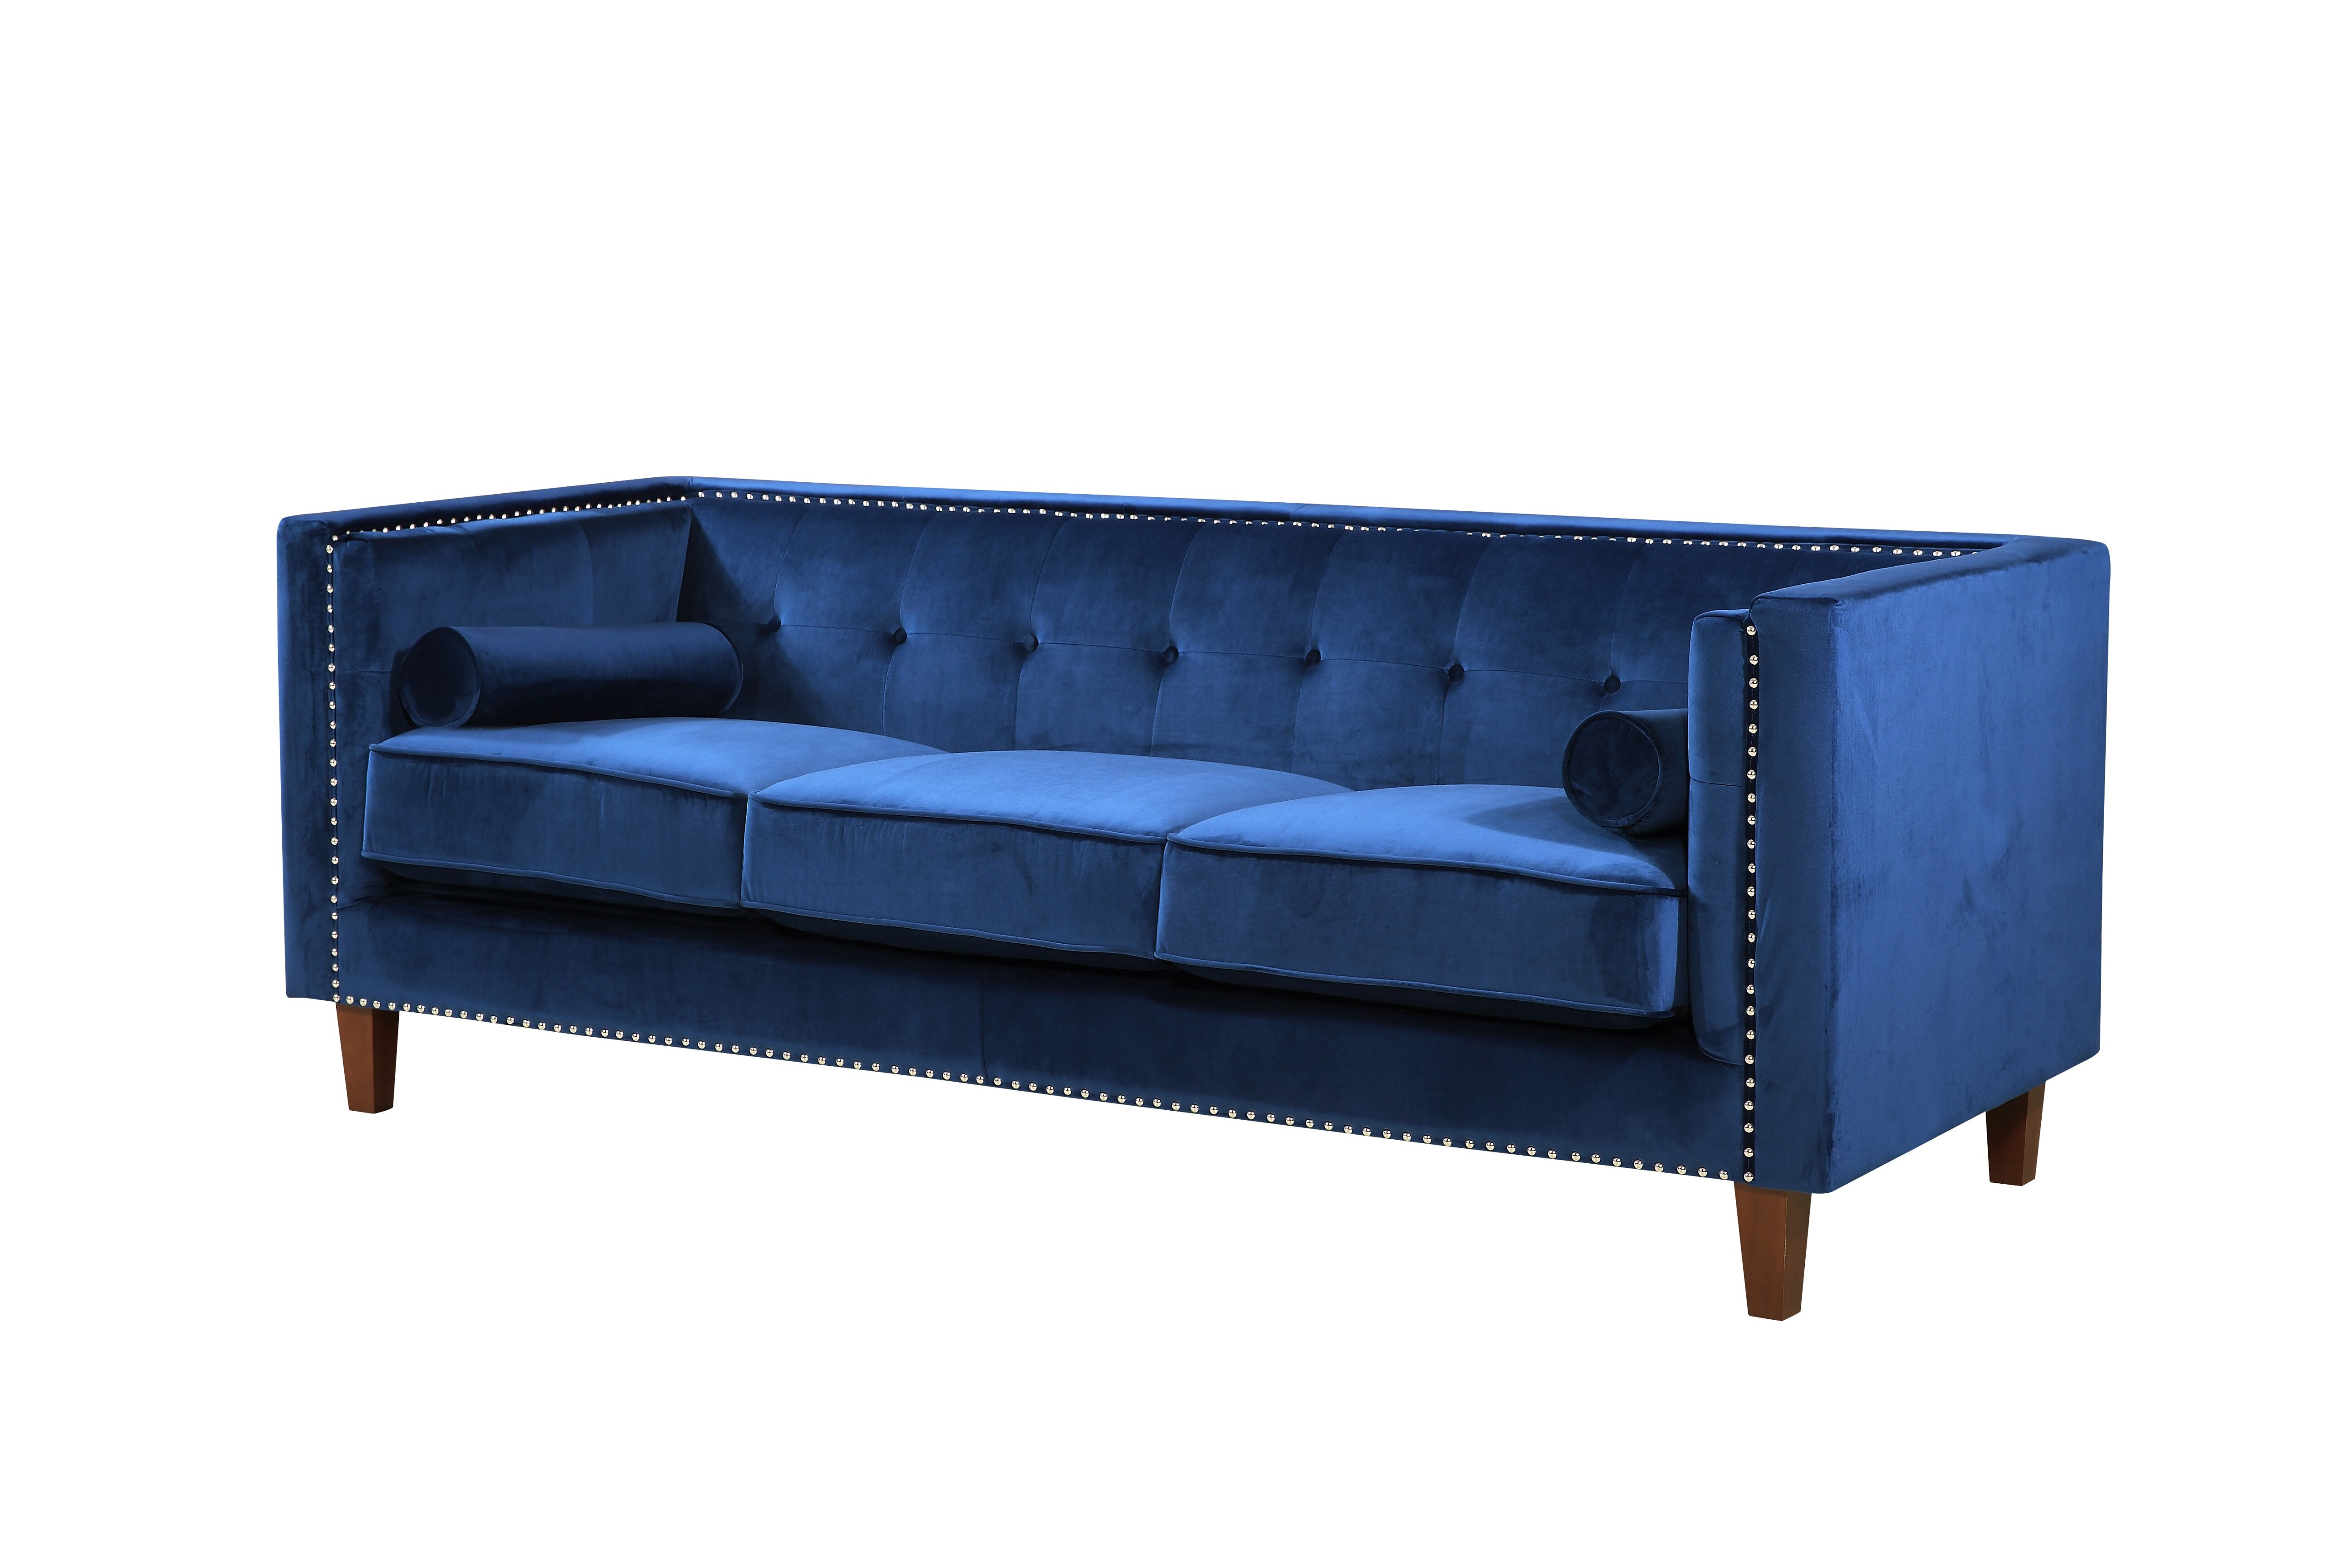 Kittleson Classic Nailhead Chesterfield Sofa